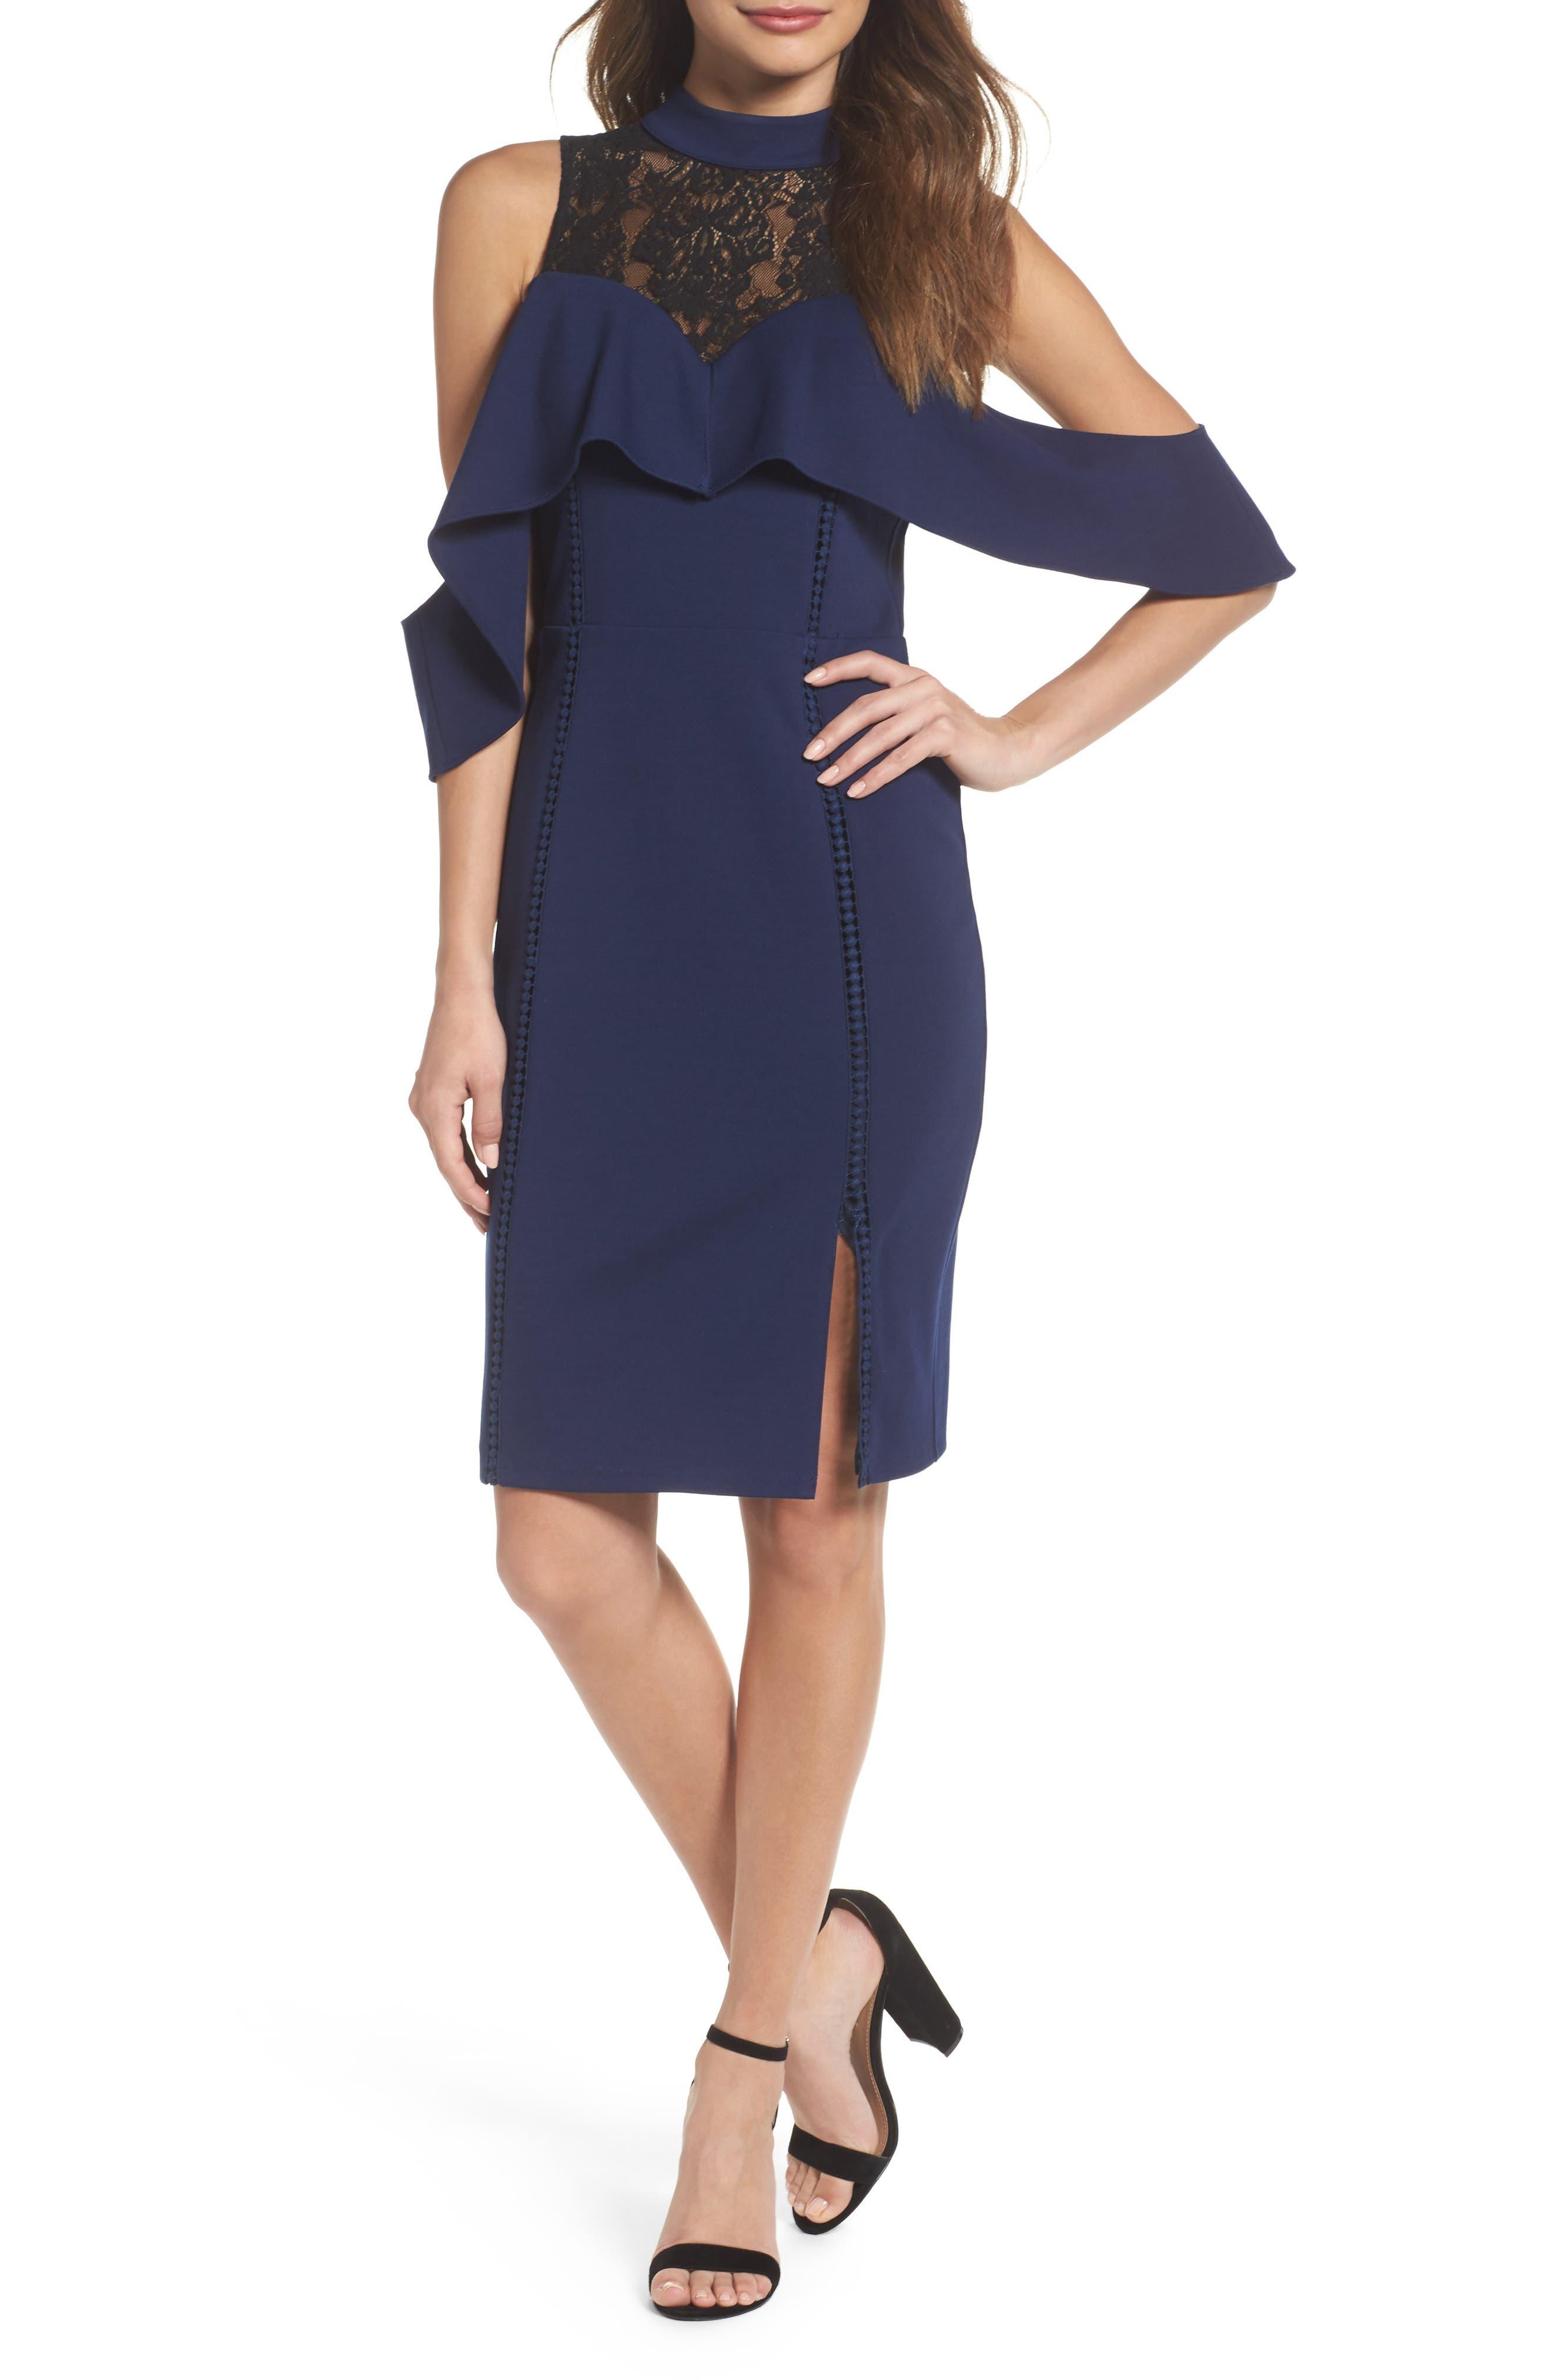 Alternate Image 1 Selected - Adelyn Rae Hadyn Cold Shoulder Sheath Dress